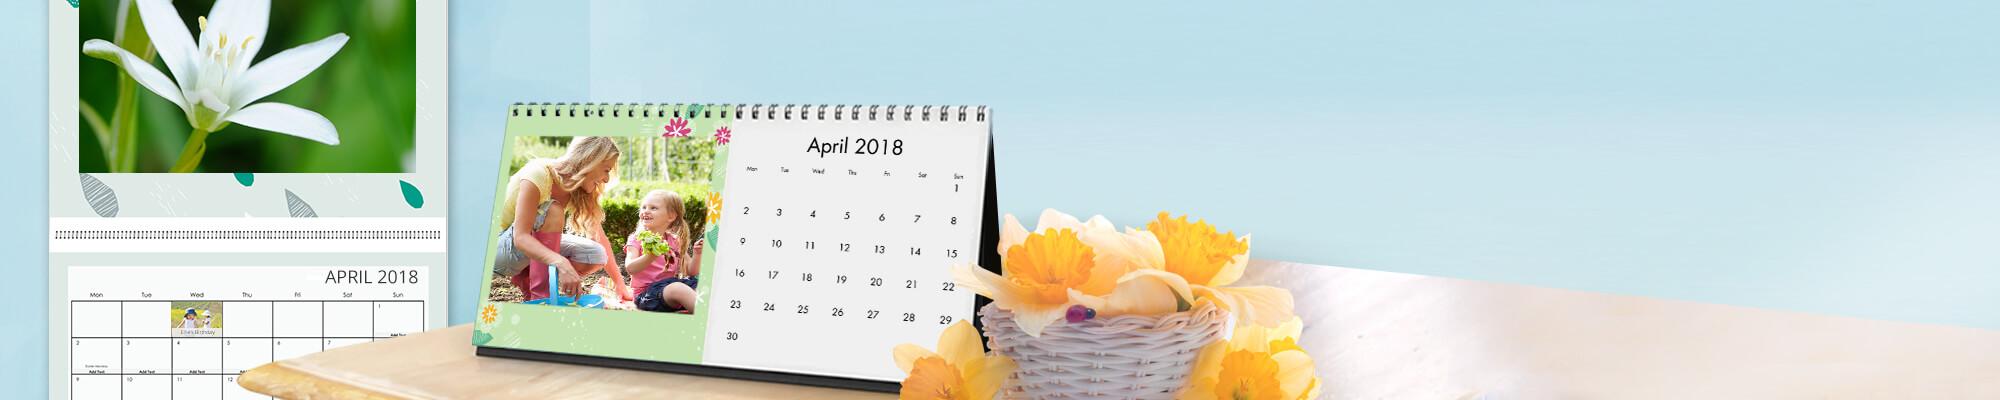 Enjoy A Smile A Day With Your Photo Calendar